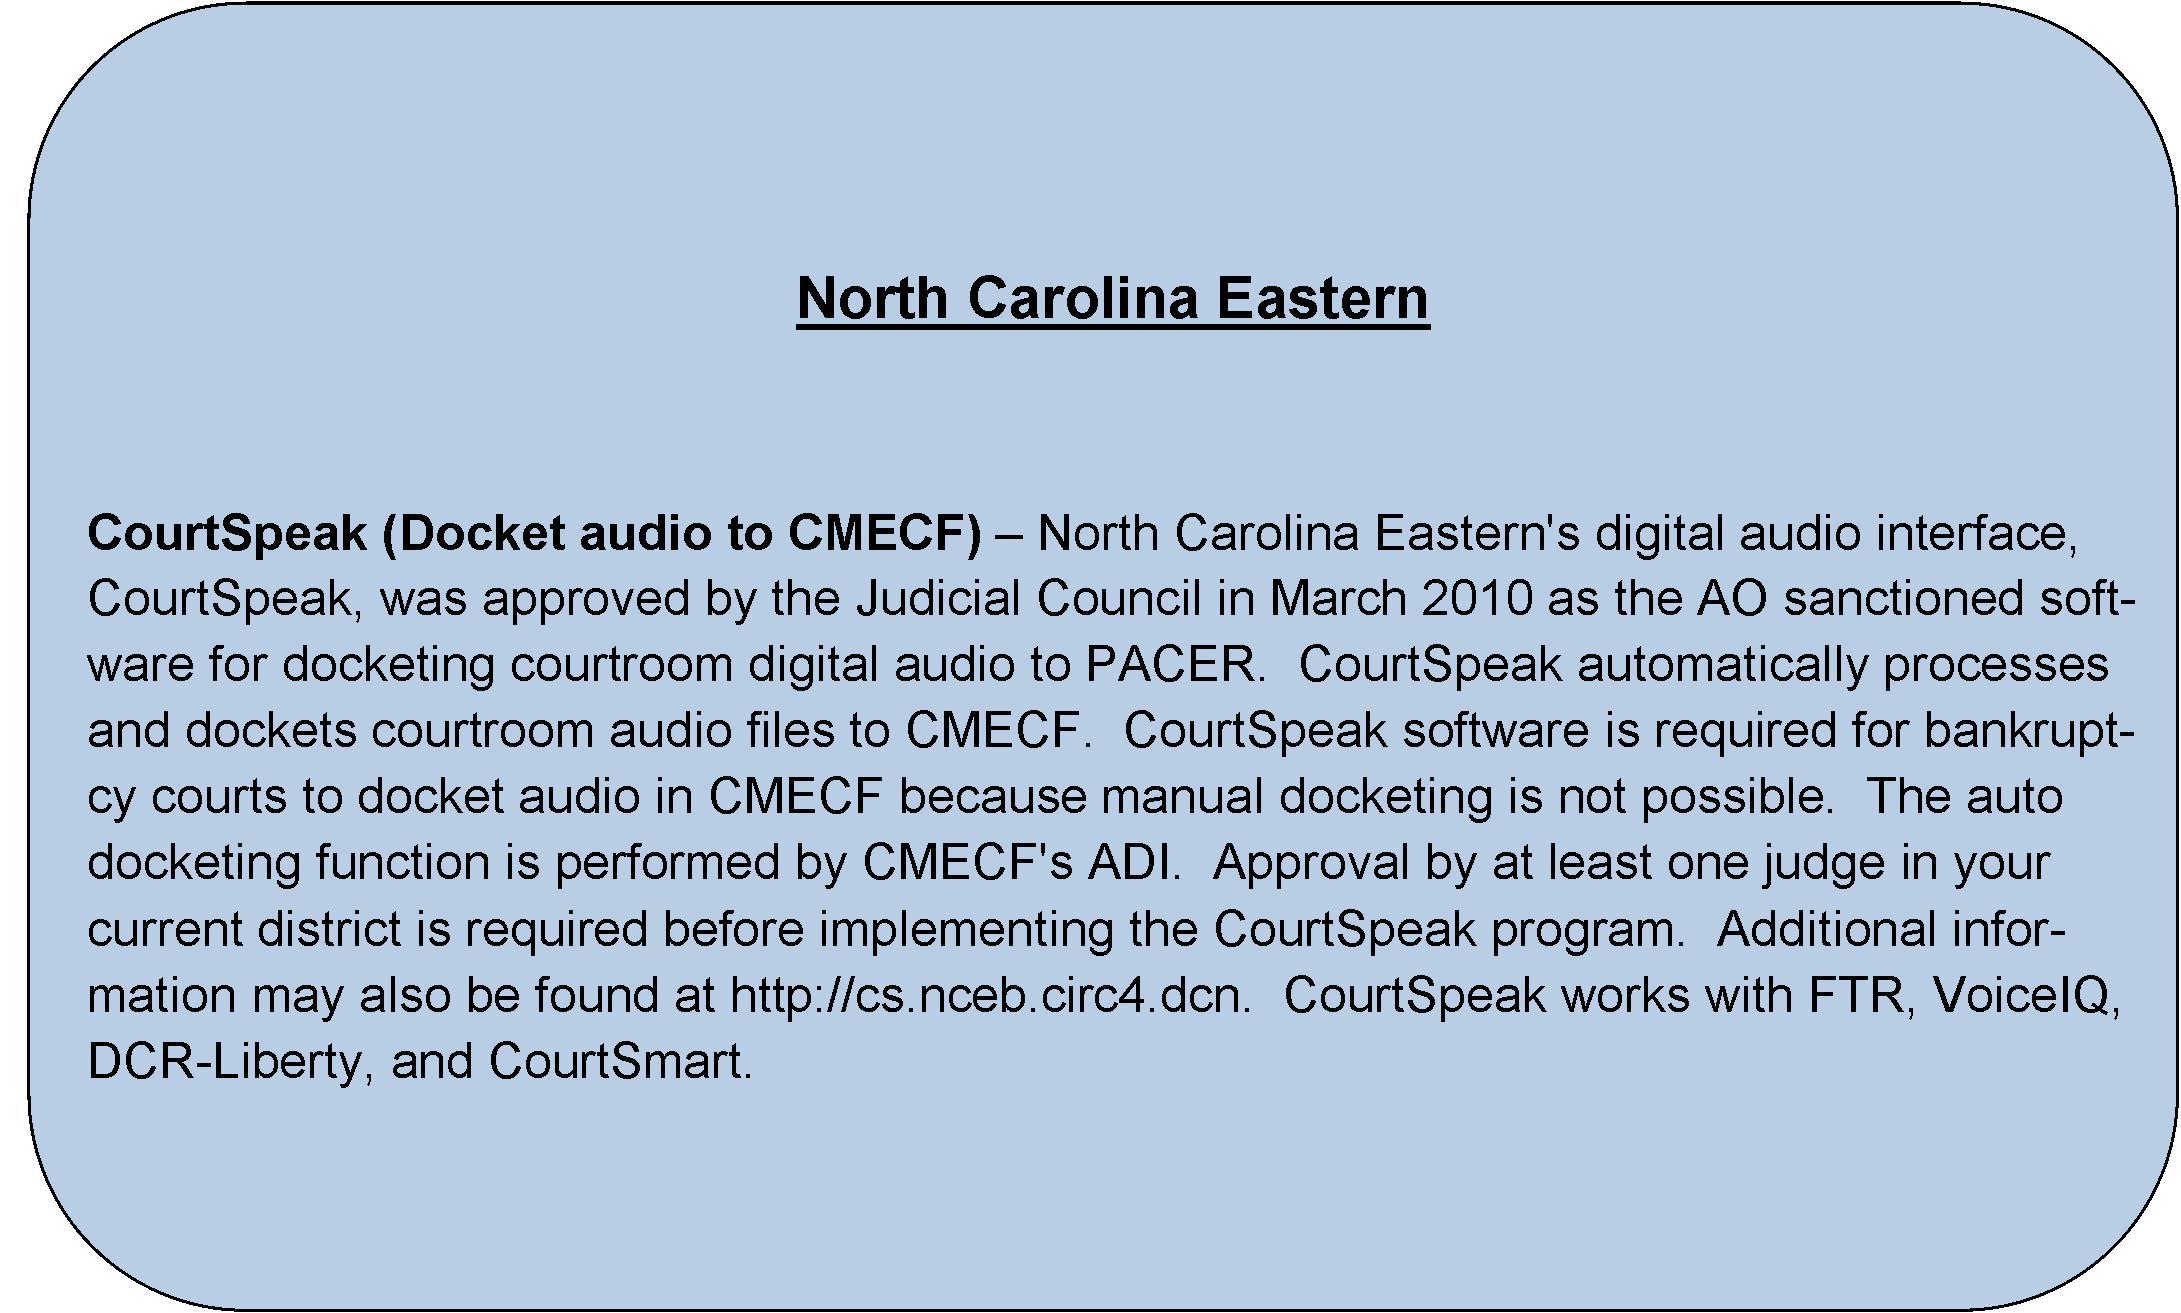 North Carolina Eastern.jpg